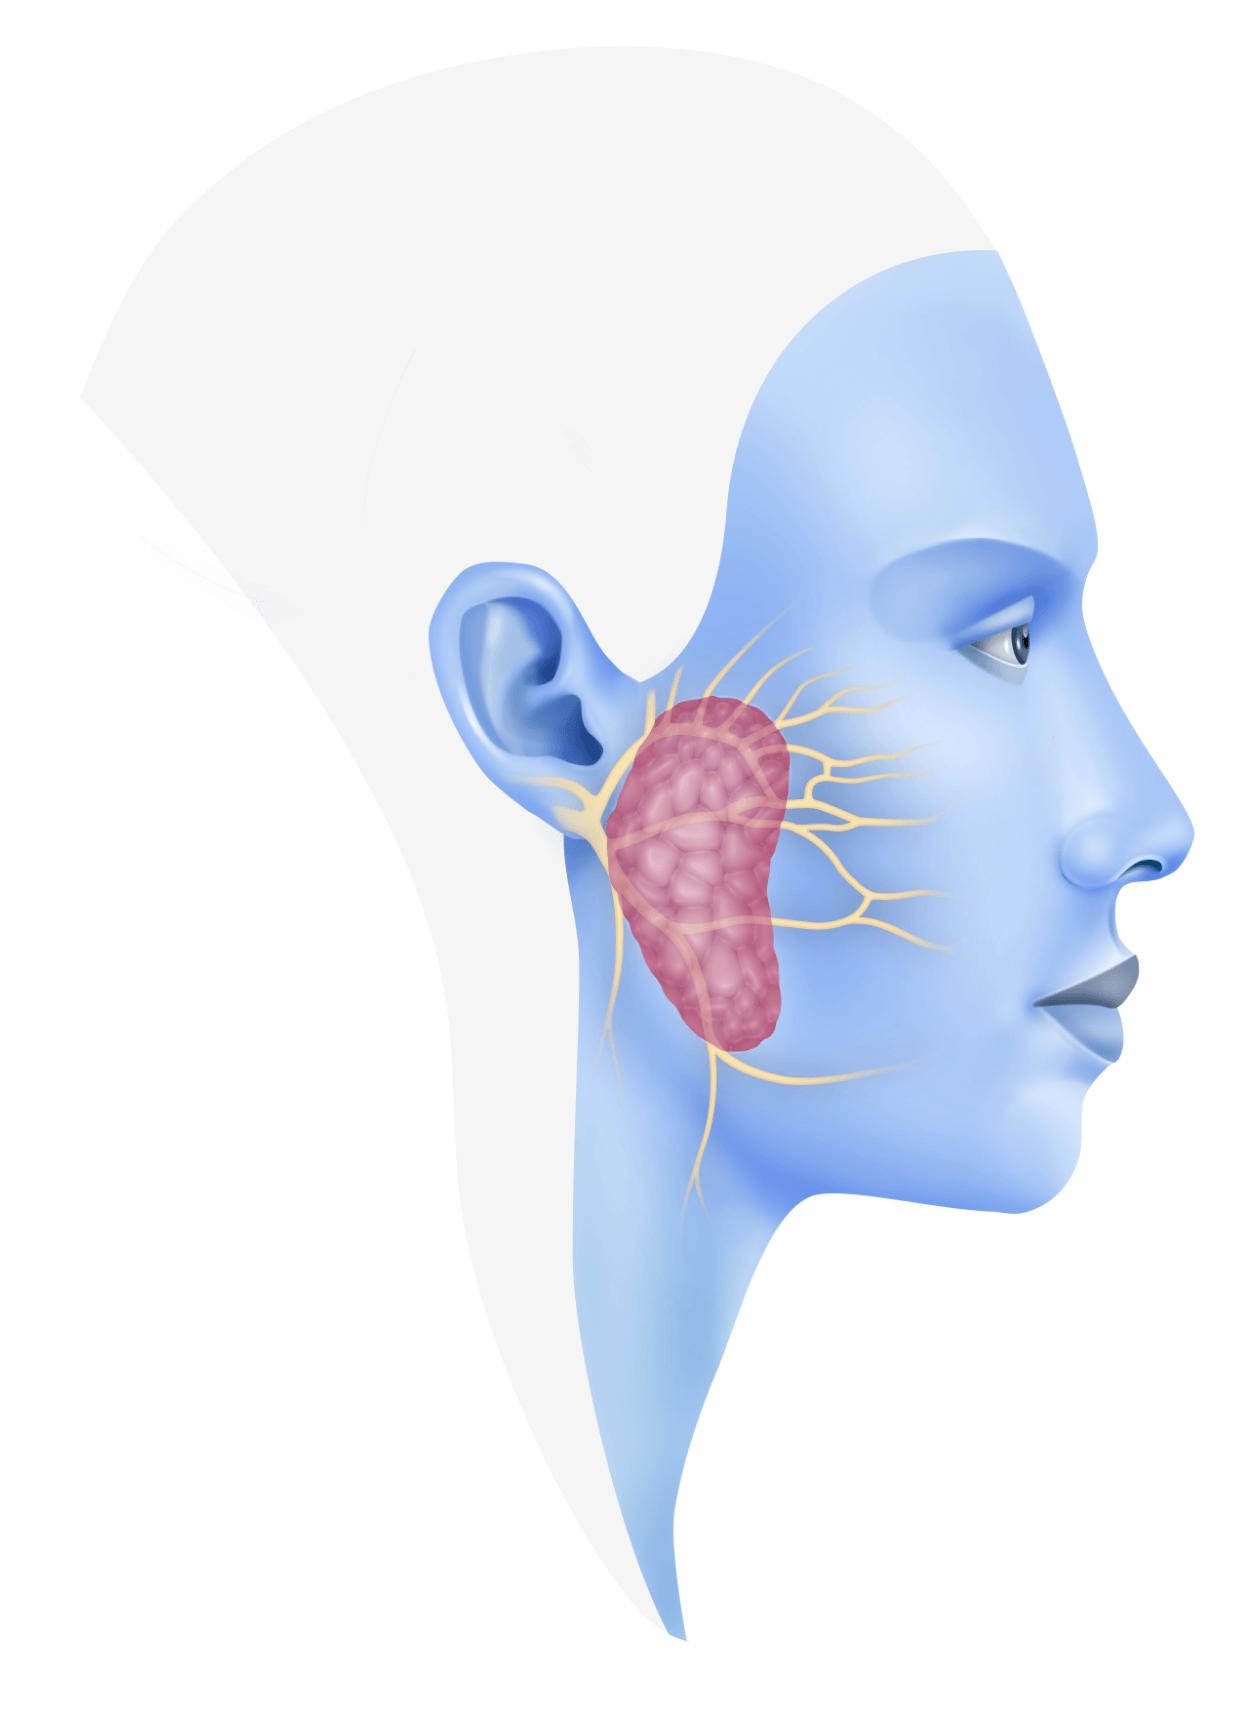 La parotida en dolor izquierda glandula